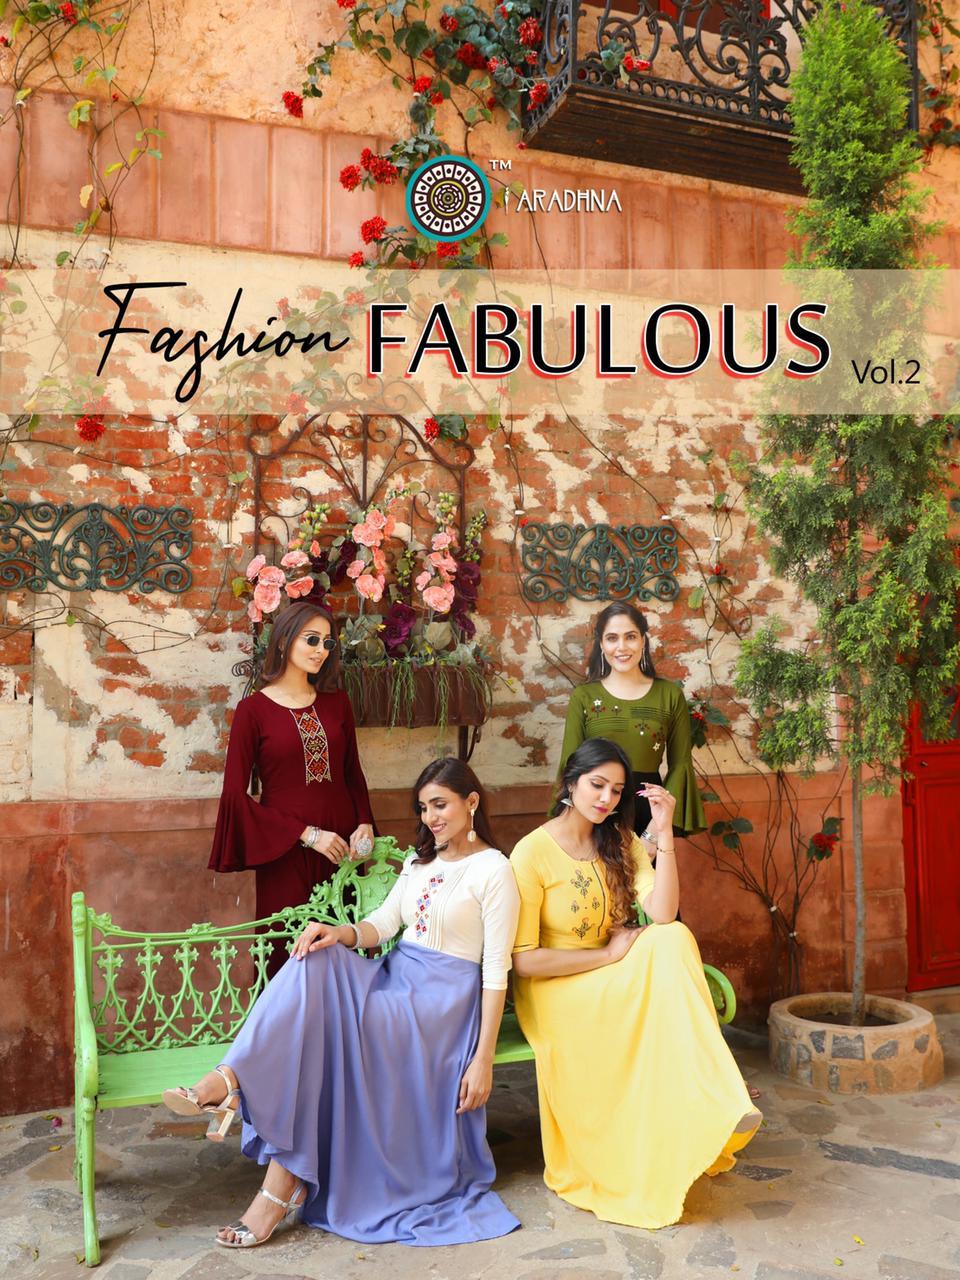 Aradhna Fashion Fabulous Vol 2 Kurti Wholesale Catalog 12 Pcs 1 - Aradhna Fashion Fabulous Vol 2 Kurti Wholesale Catalog 12 Pcs